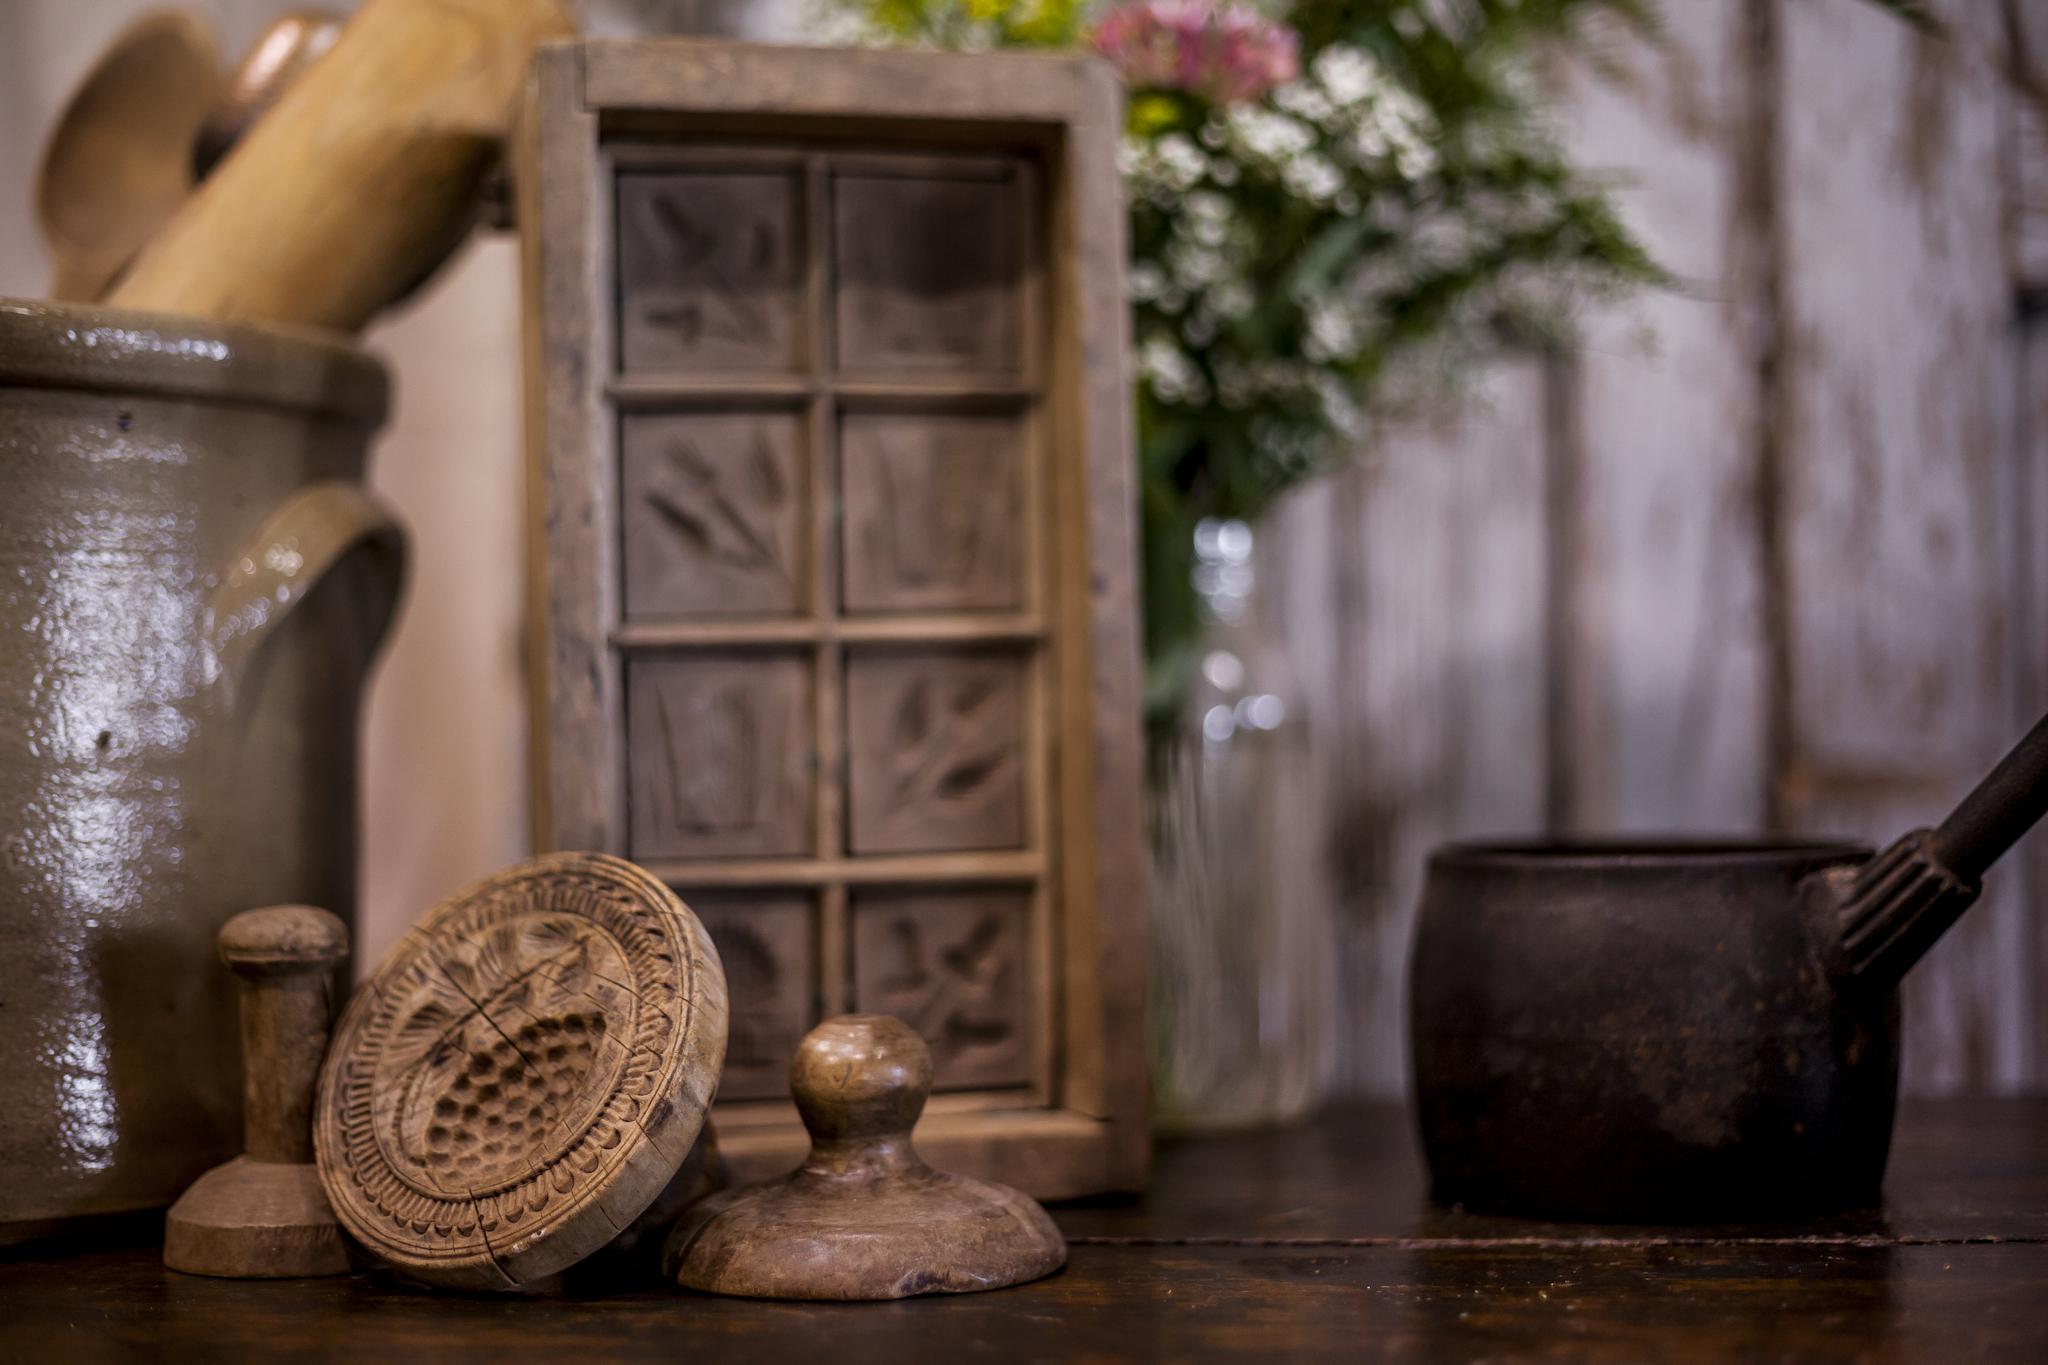 Antique and Unique Bric-a-brac Collections